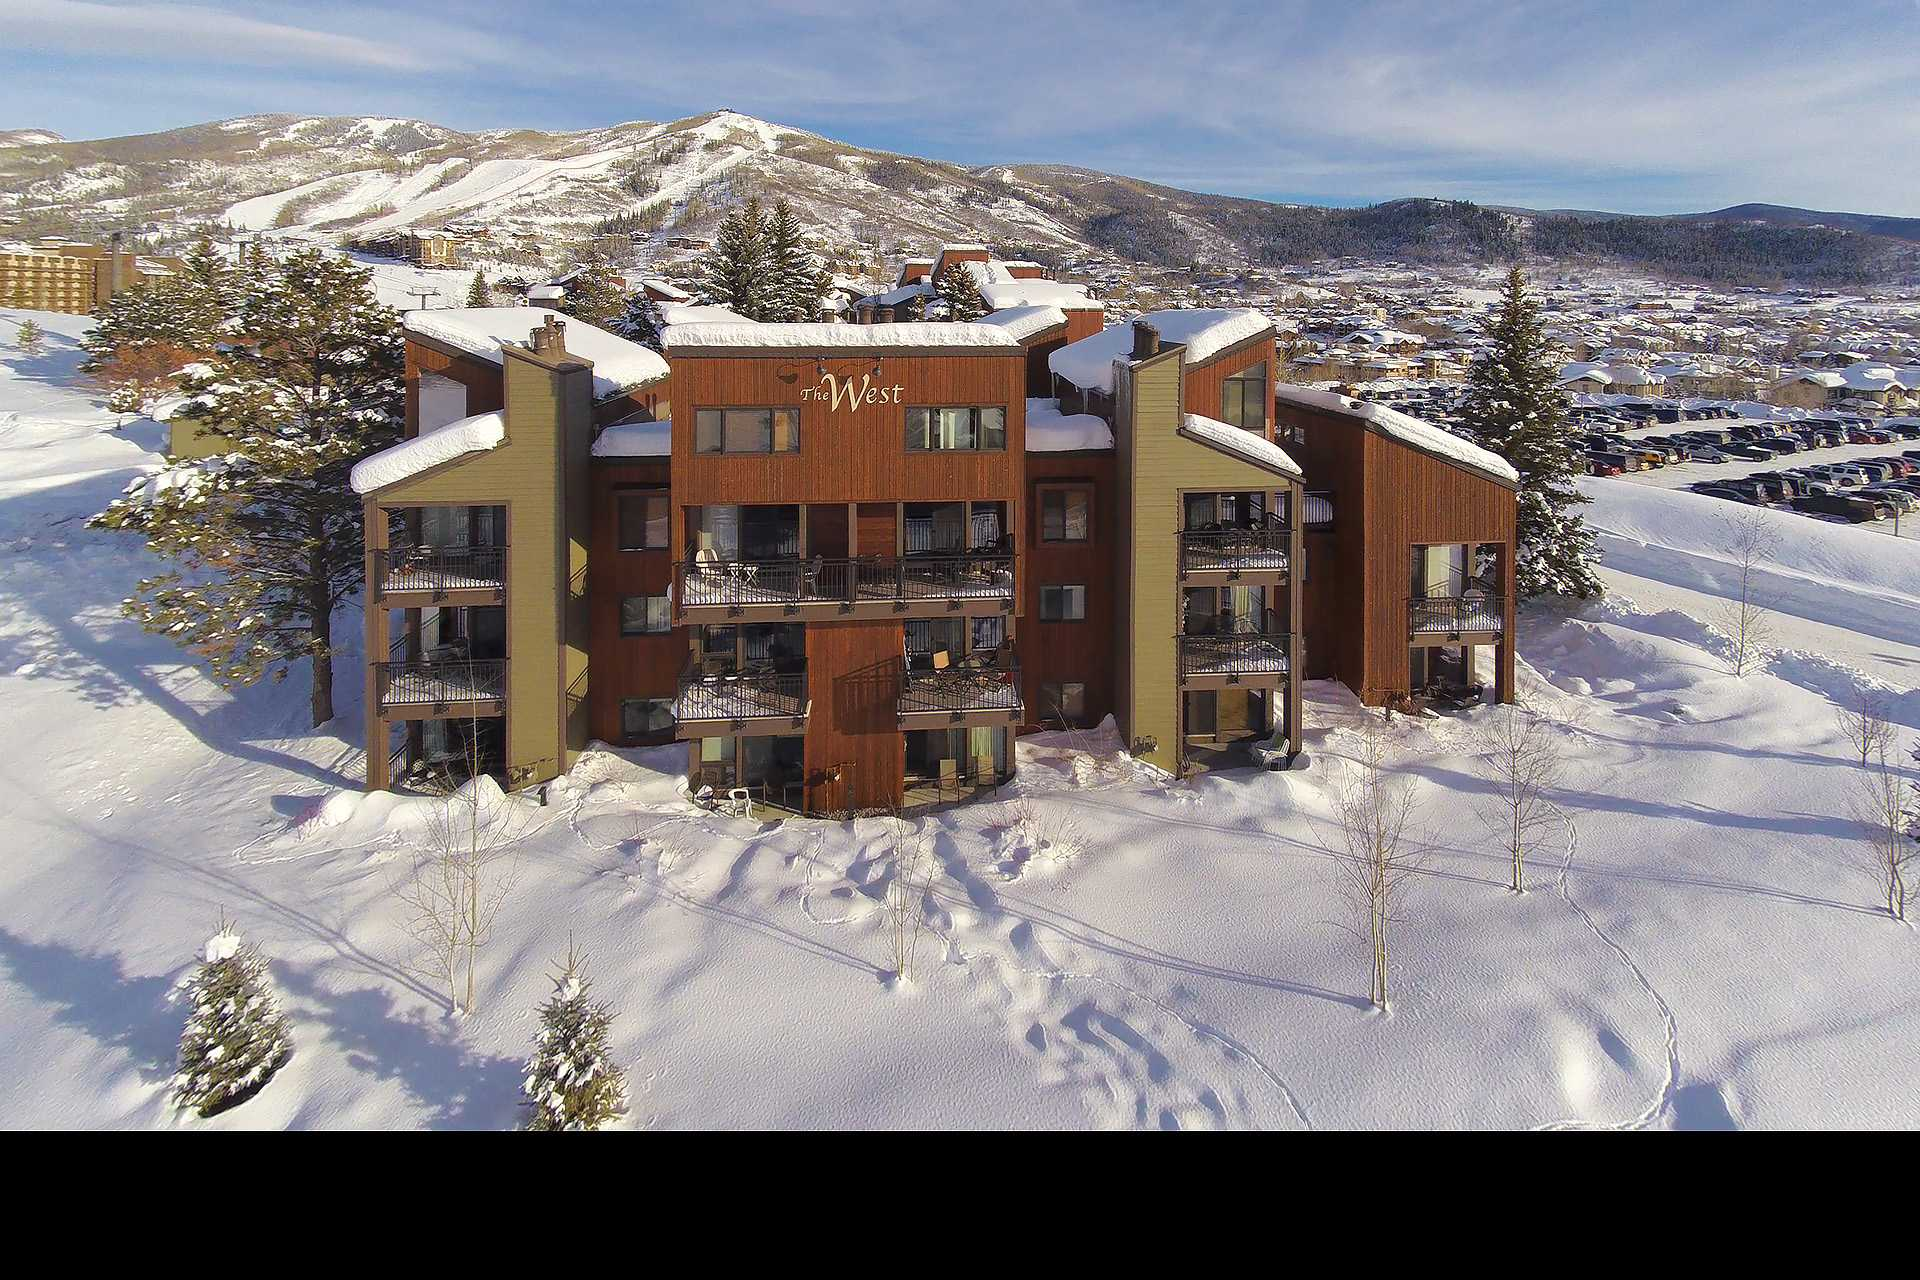 W3532: The West Condominiums